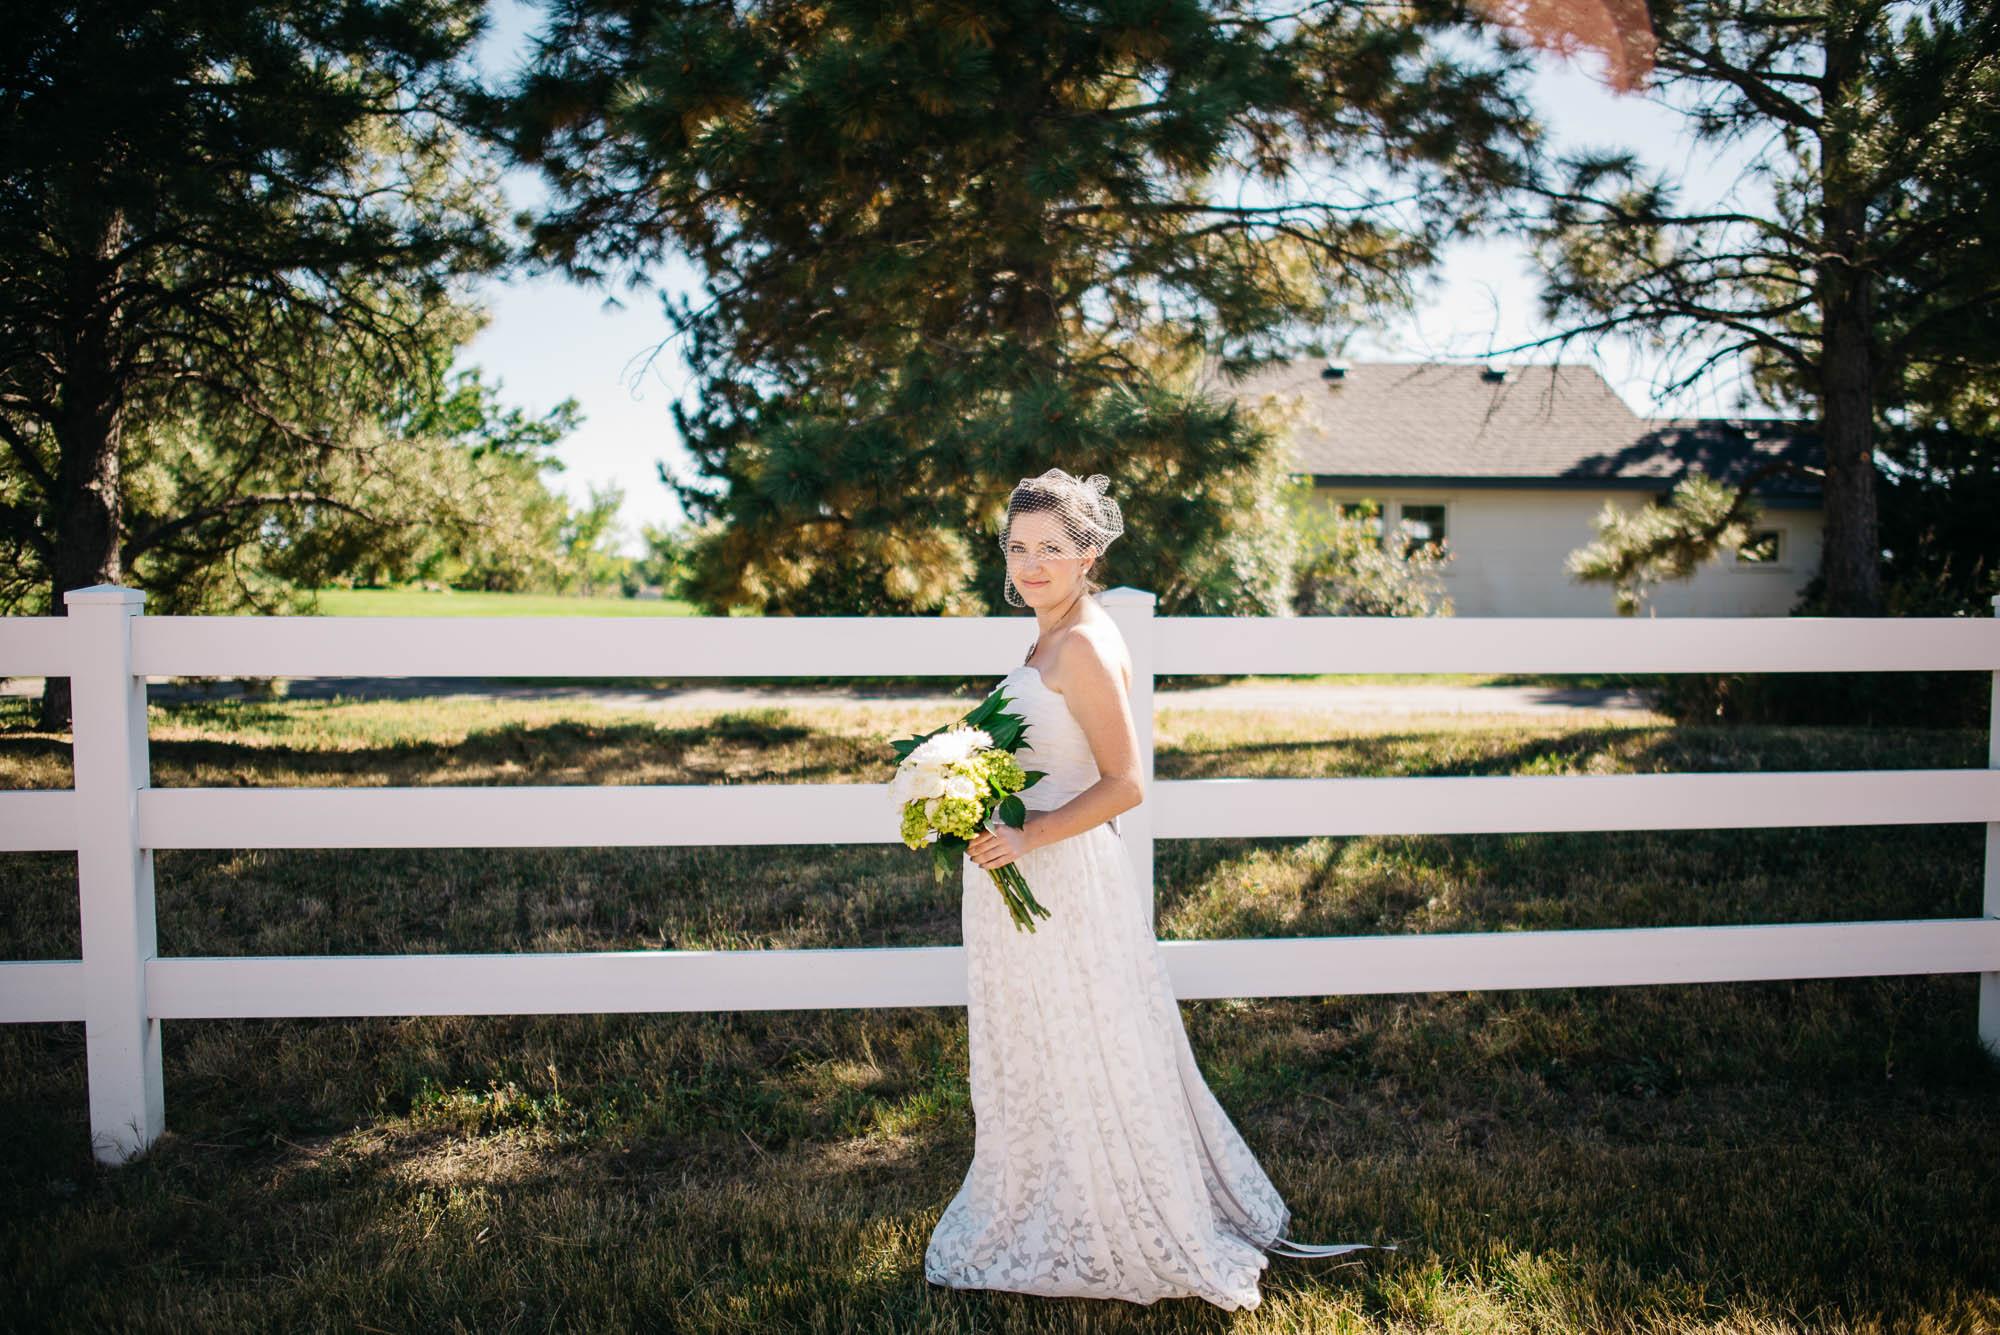 132elopement-photographer-colorado-April&TJ-Wedding_Jackass-Hill_wedding-0844.jpg